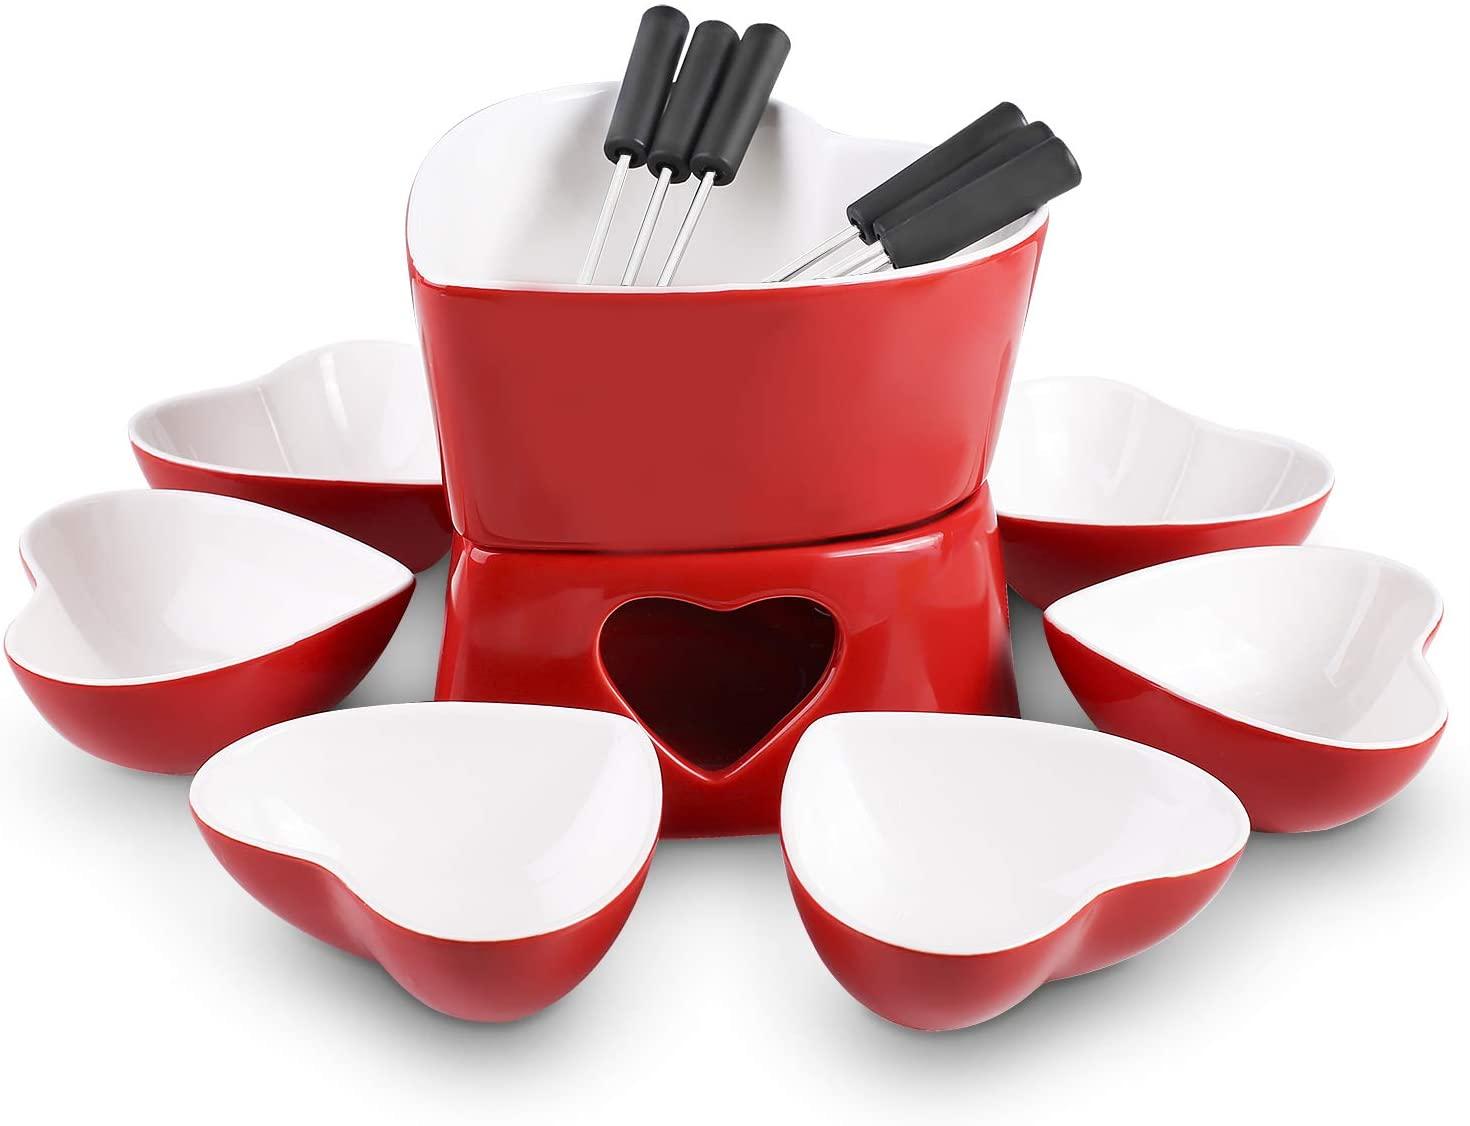 Ceramic chocolate cheese fondue pot sets